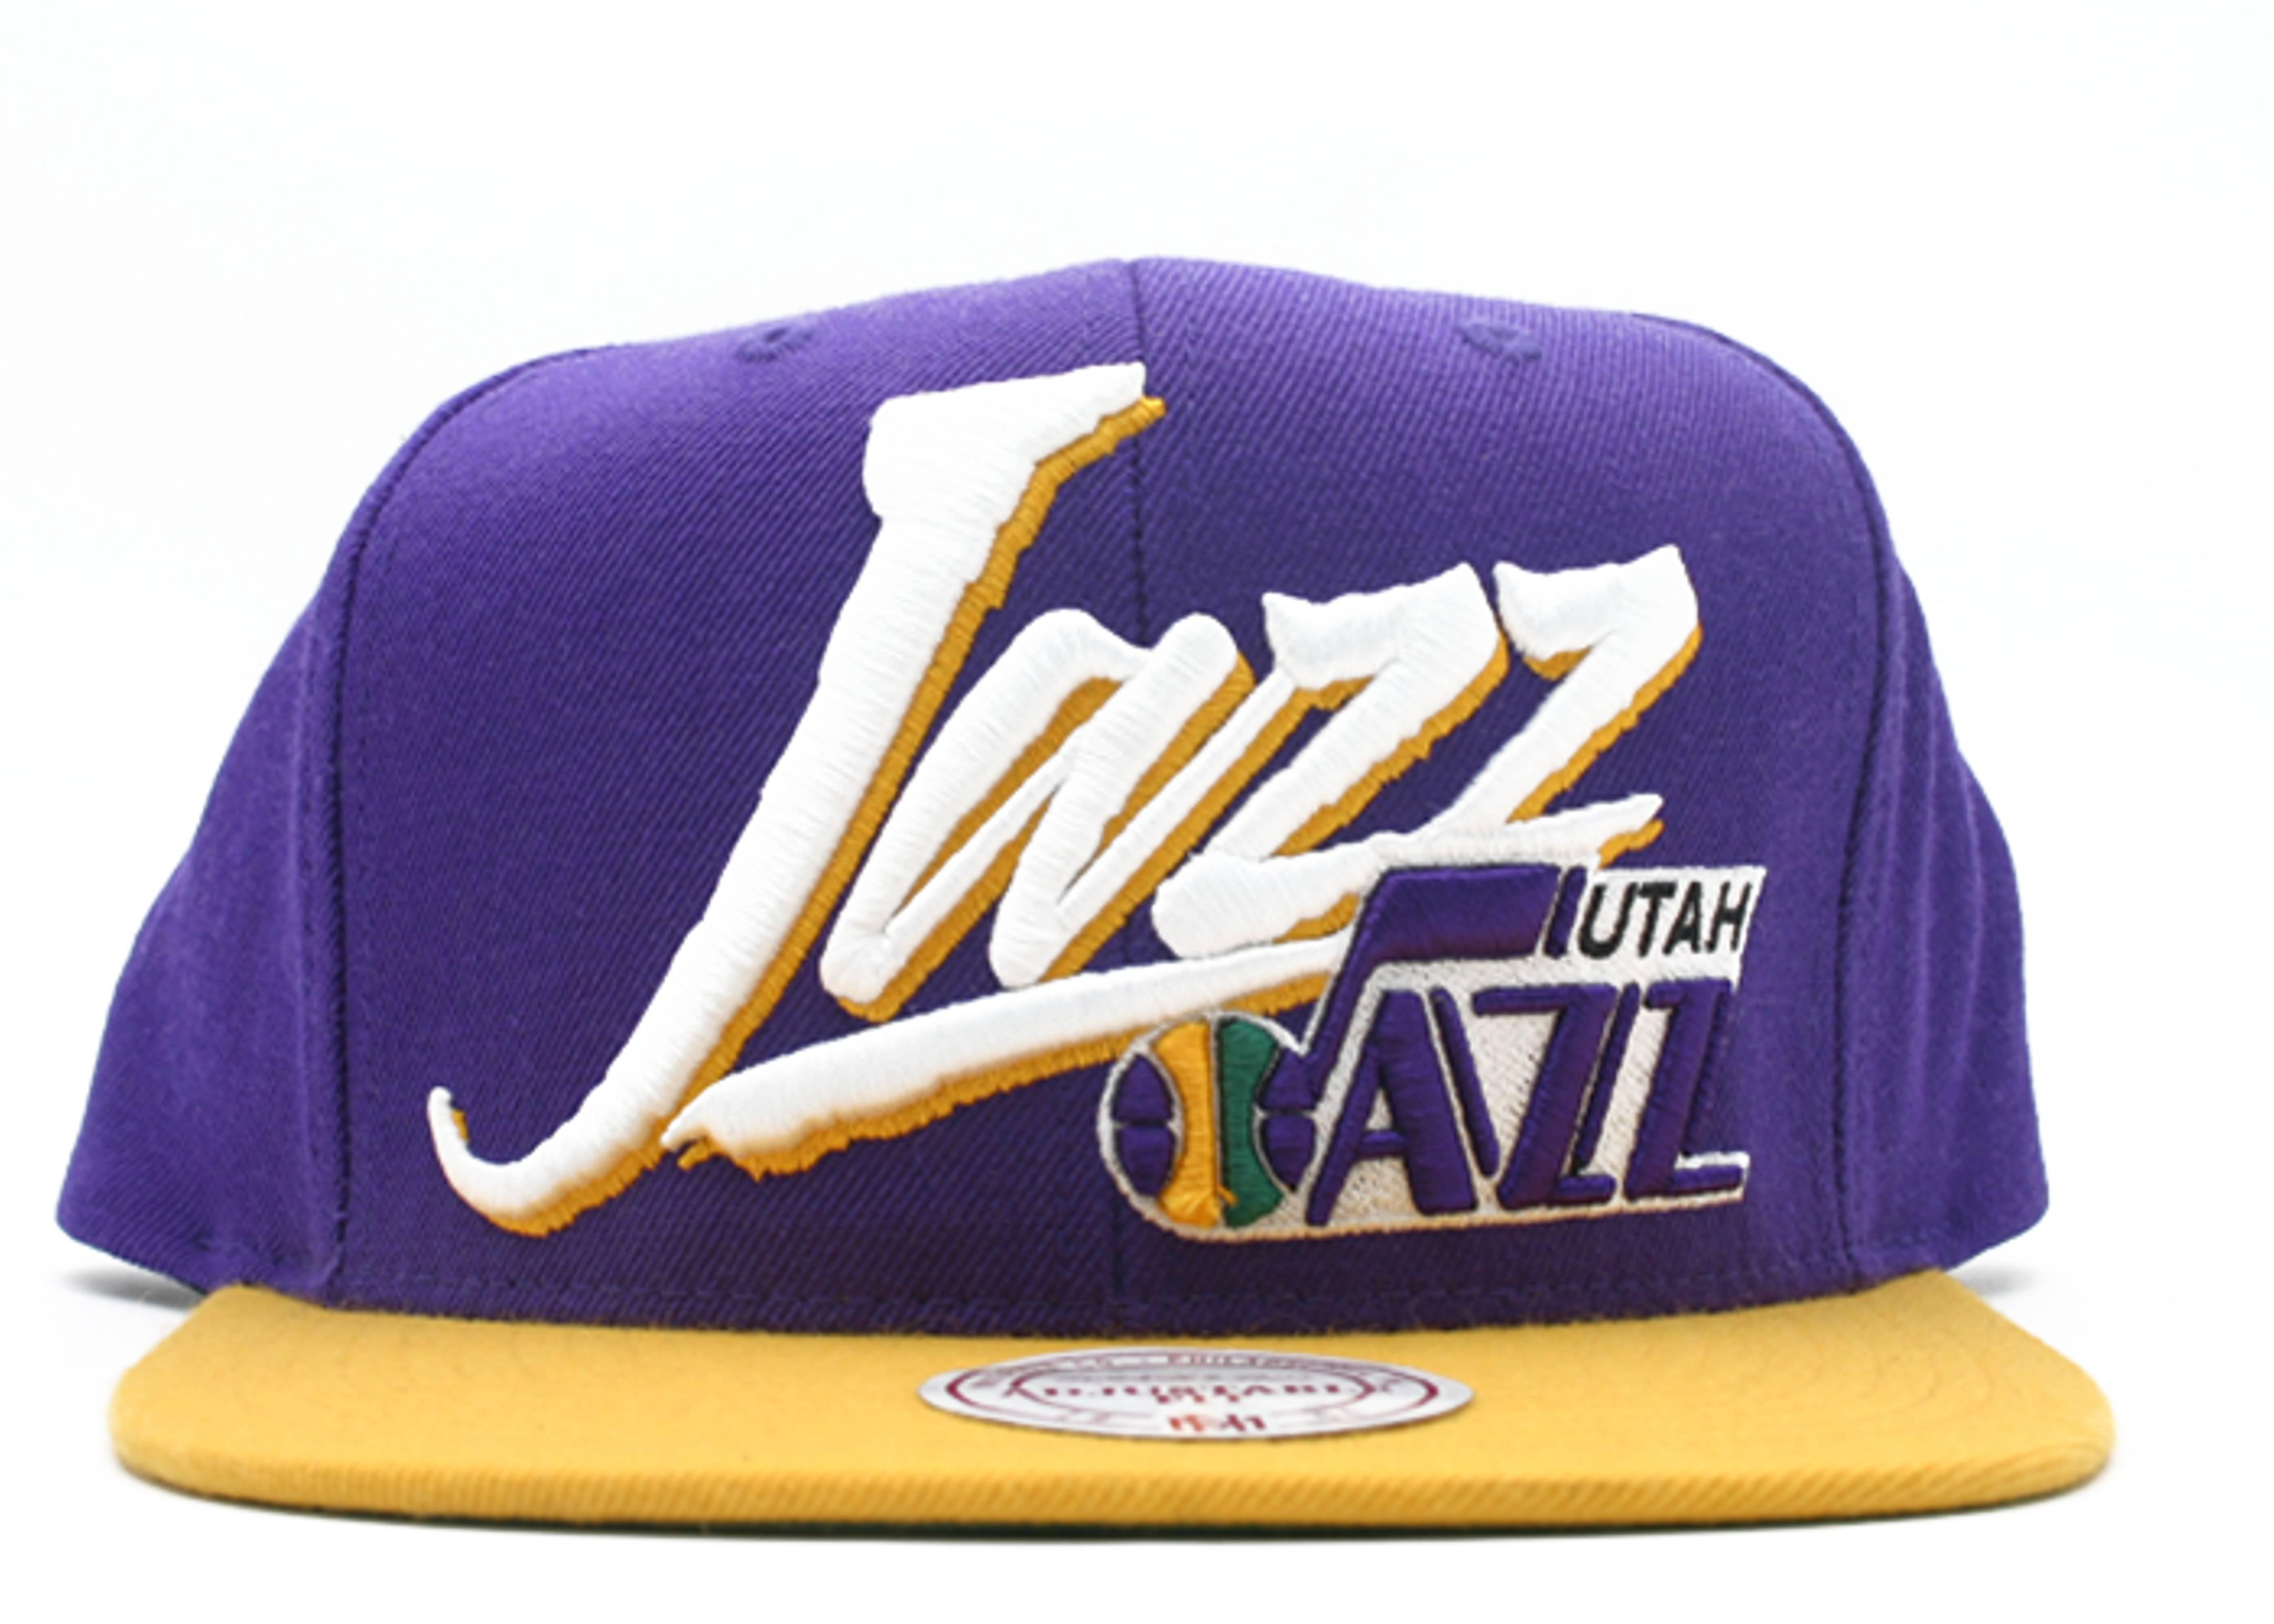 utah jazz snap-back